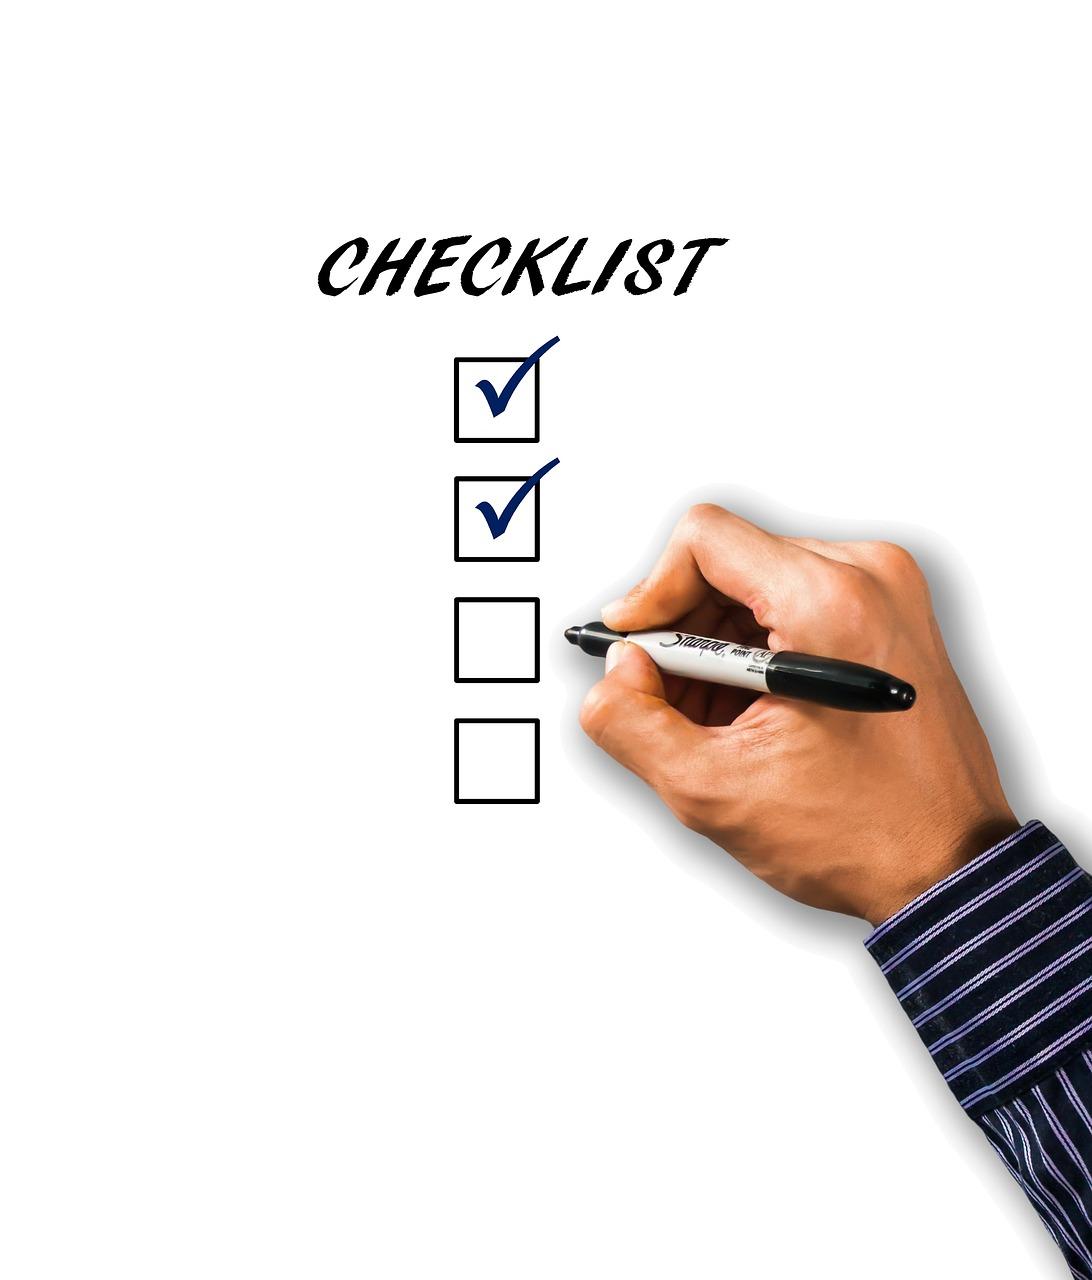 checklist-1919292_1280